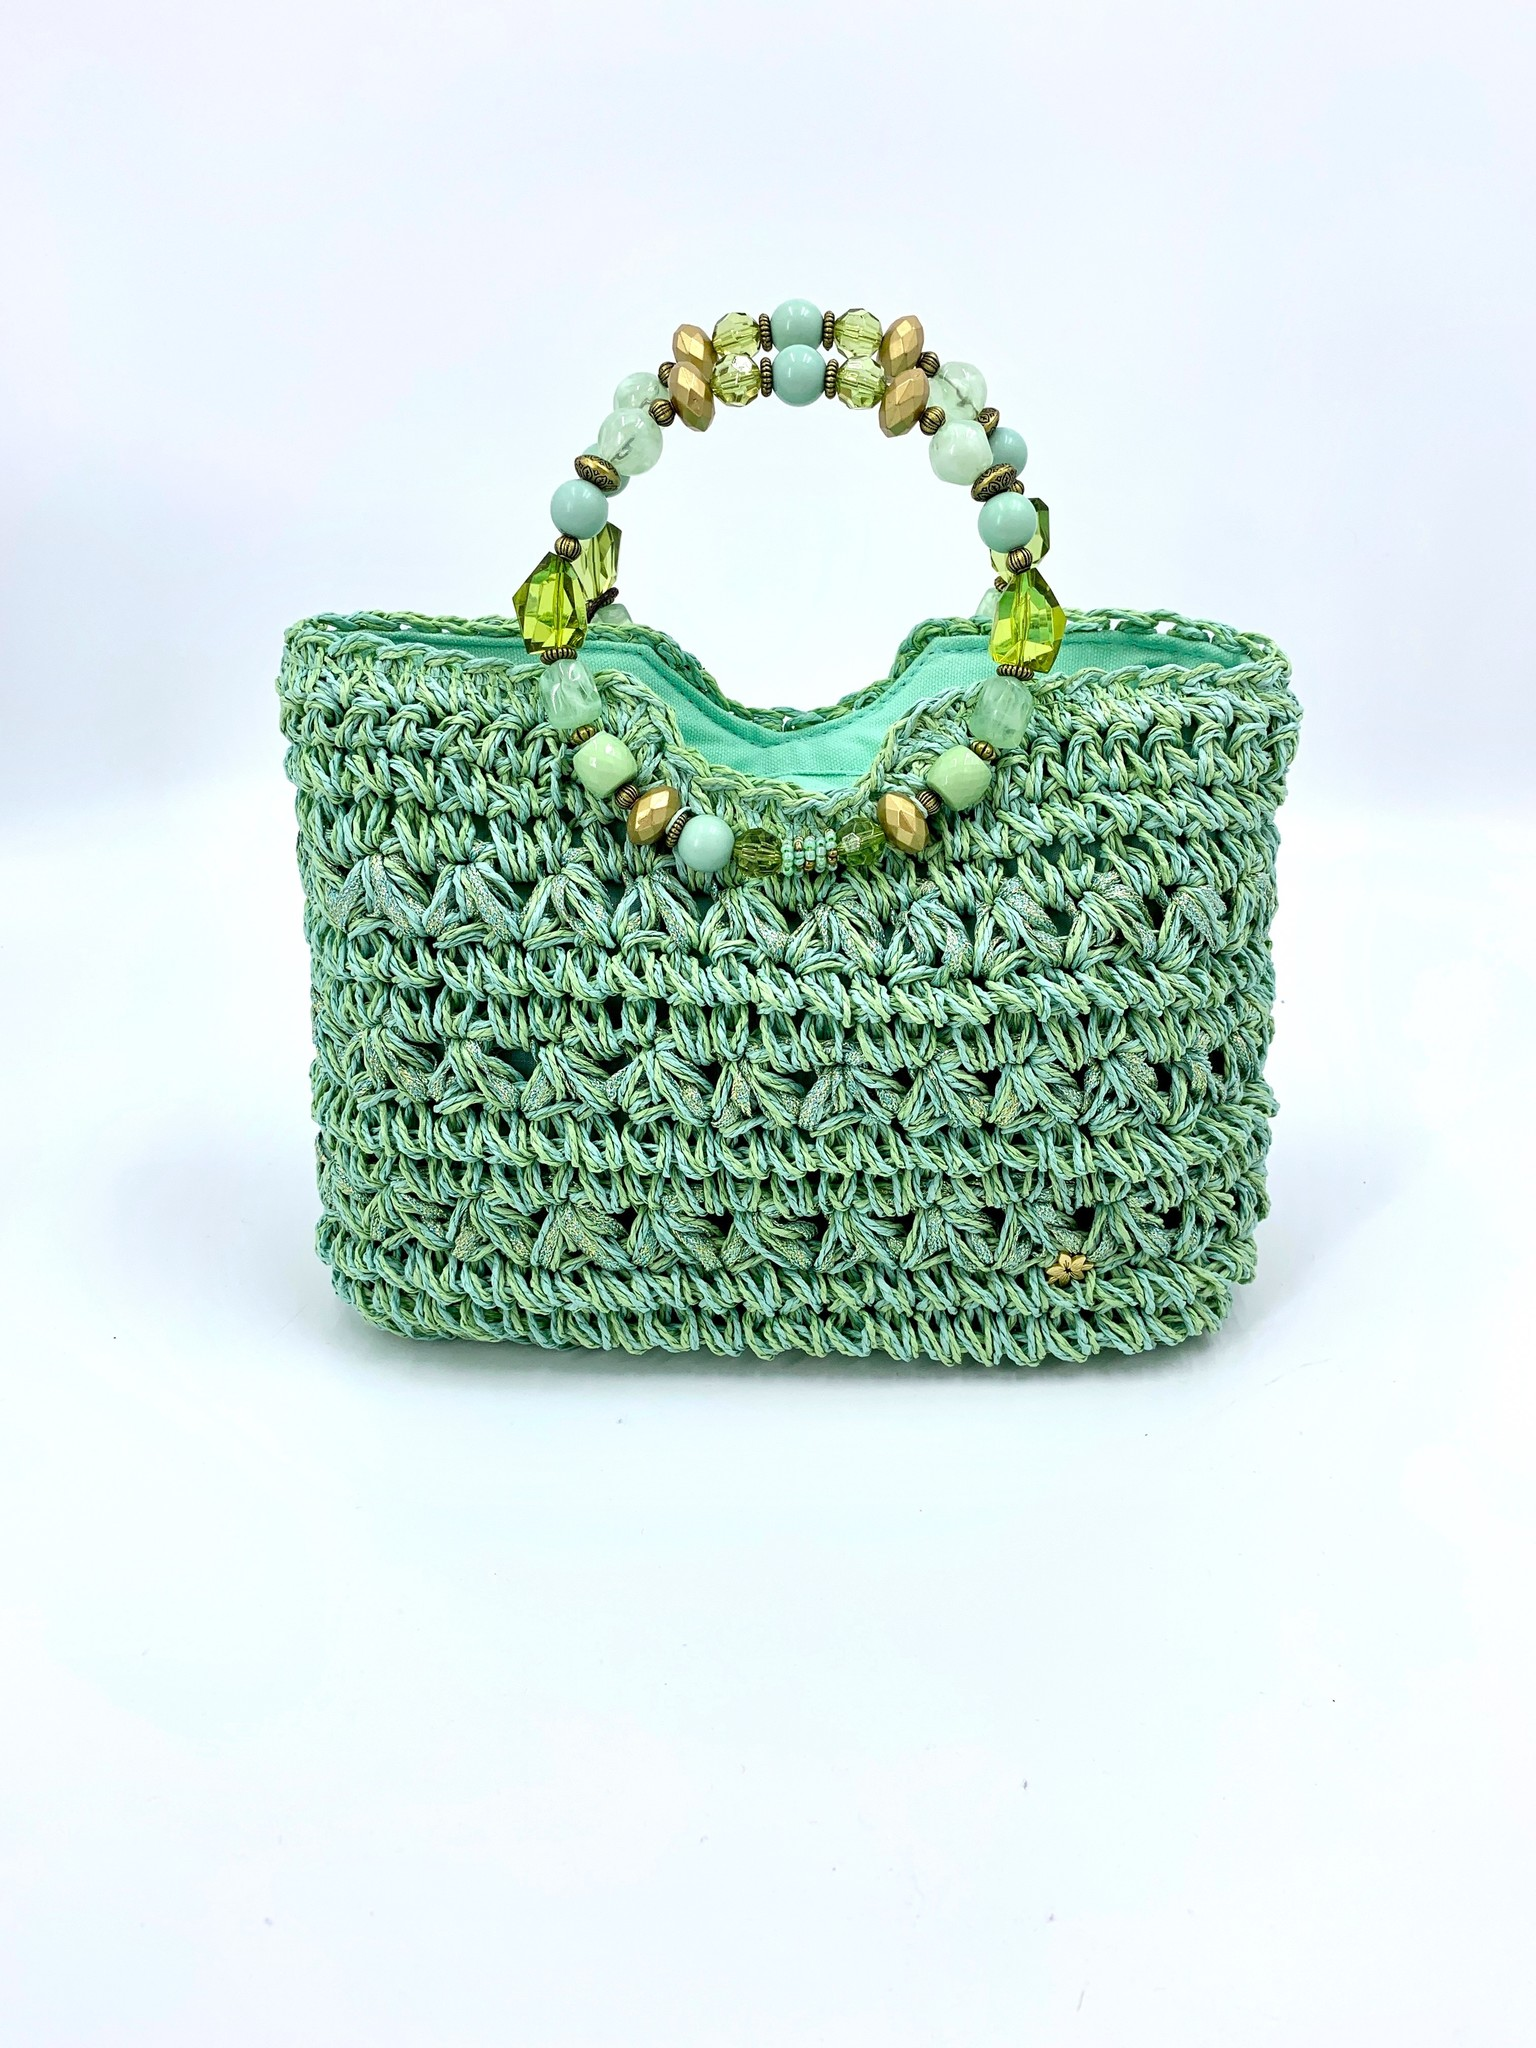 Cappelli Jeweled Handle Bag